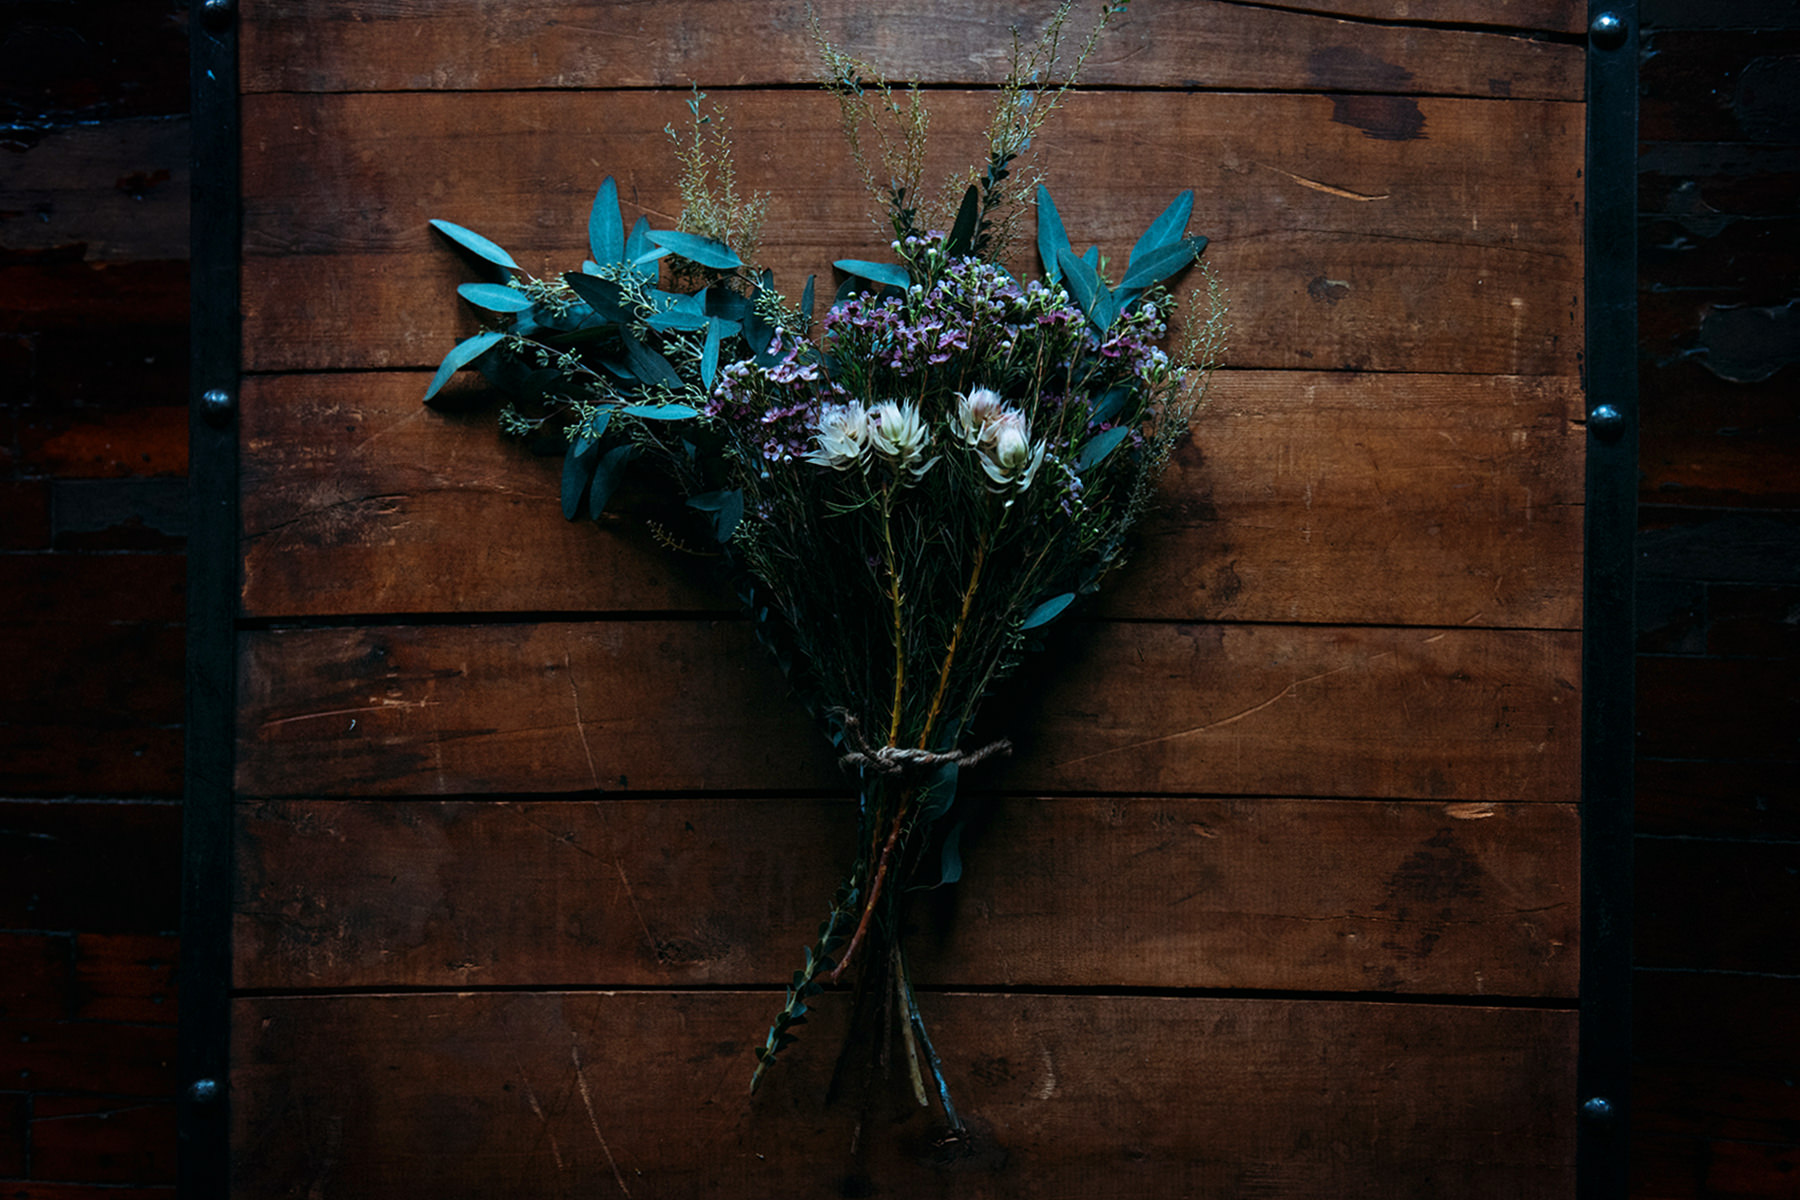 Maine Wedding Flowers - Protea, waxflower, acacia